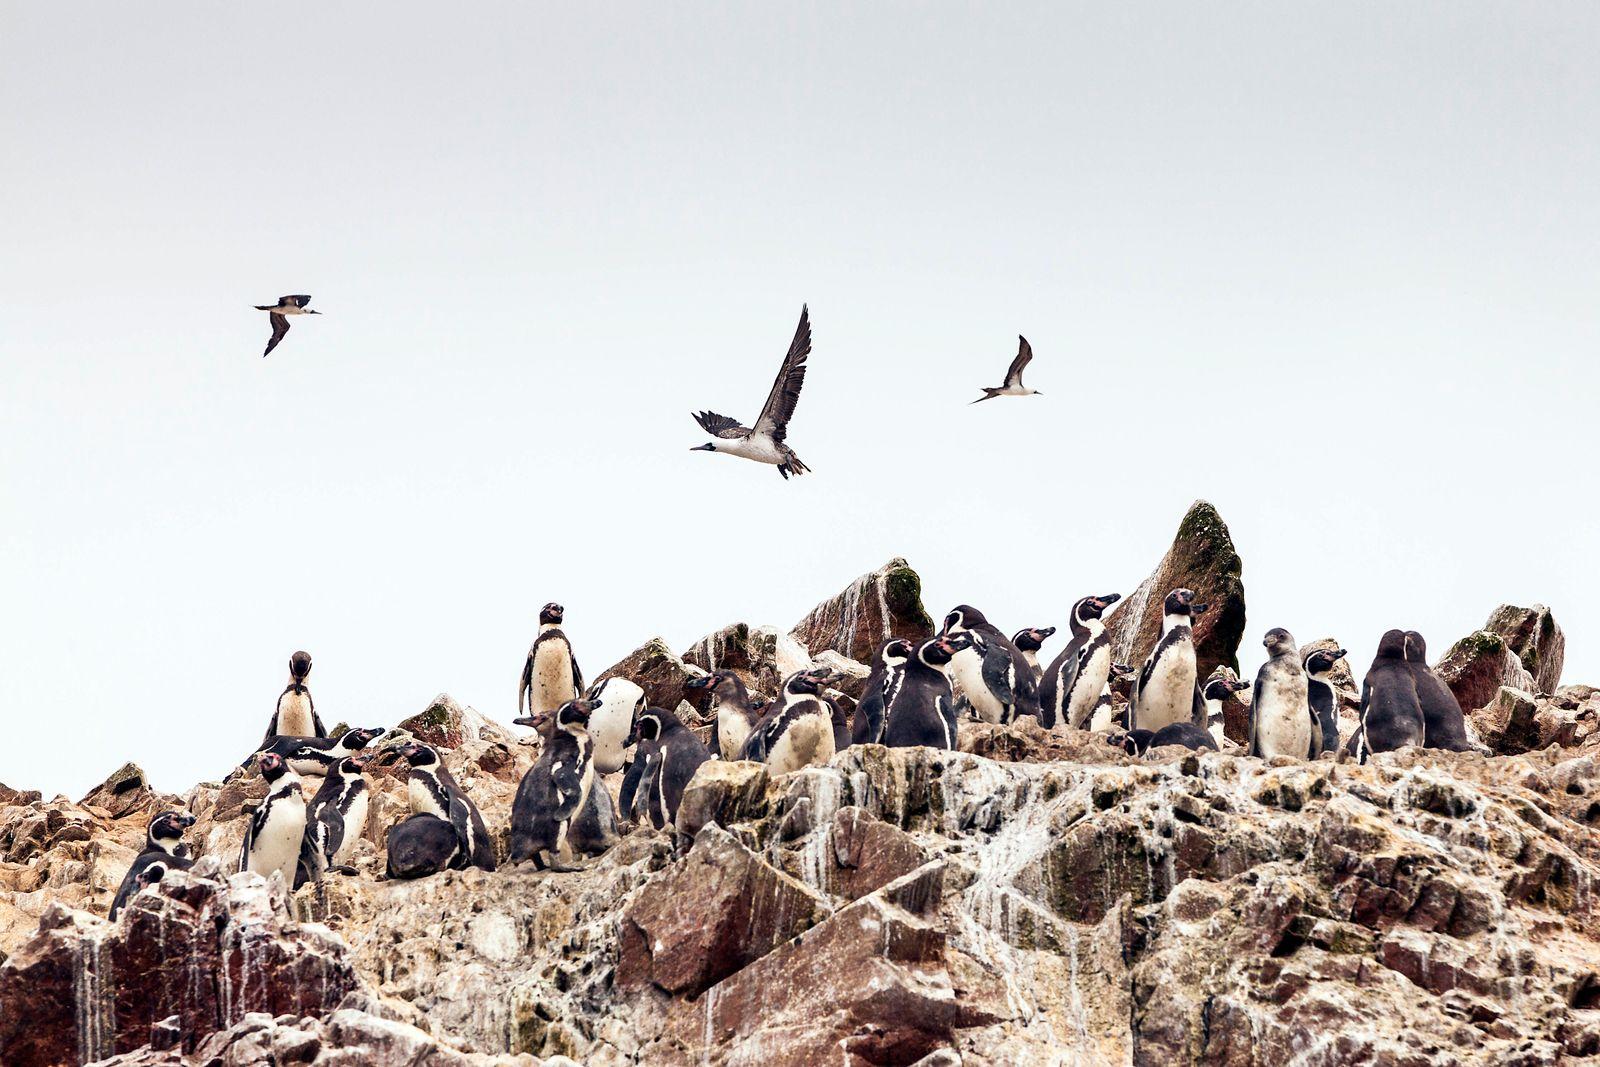 Humboldt Penguin (Spheniscus humboldti) and Peruvian booby (Sula variegata). Islas Ballestas, Paracas, Ica Region, Peru.